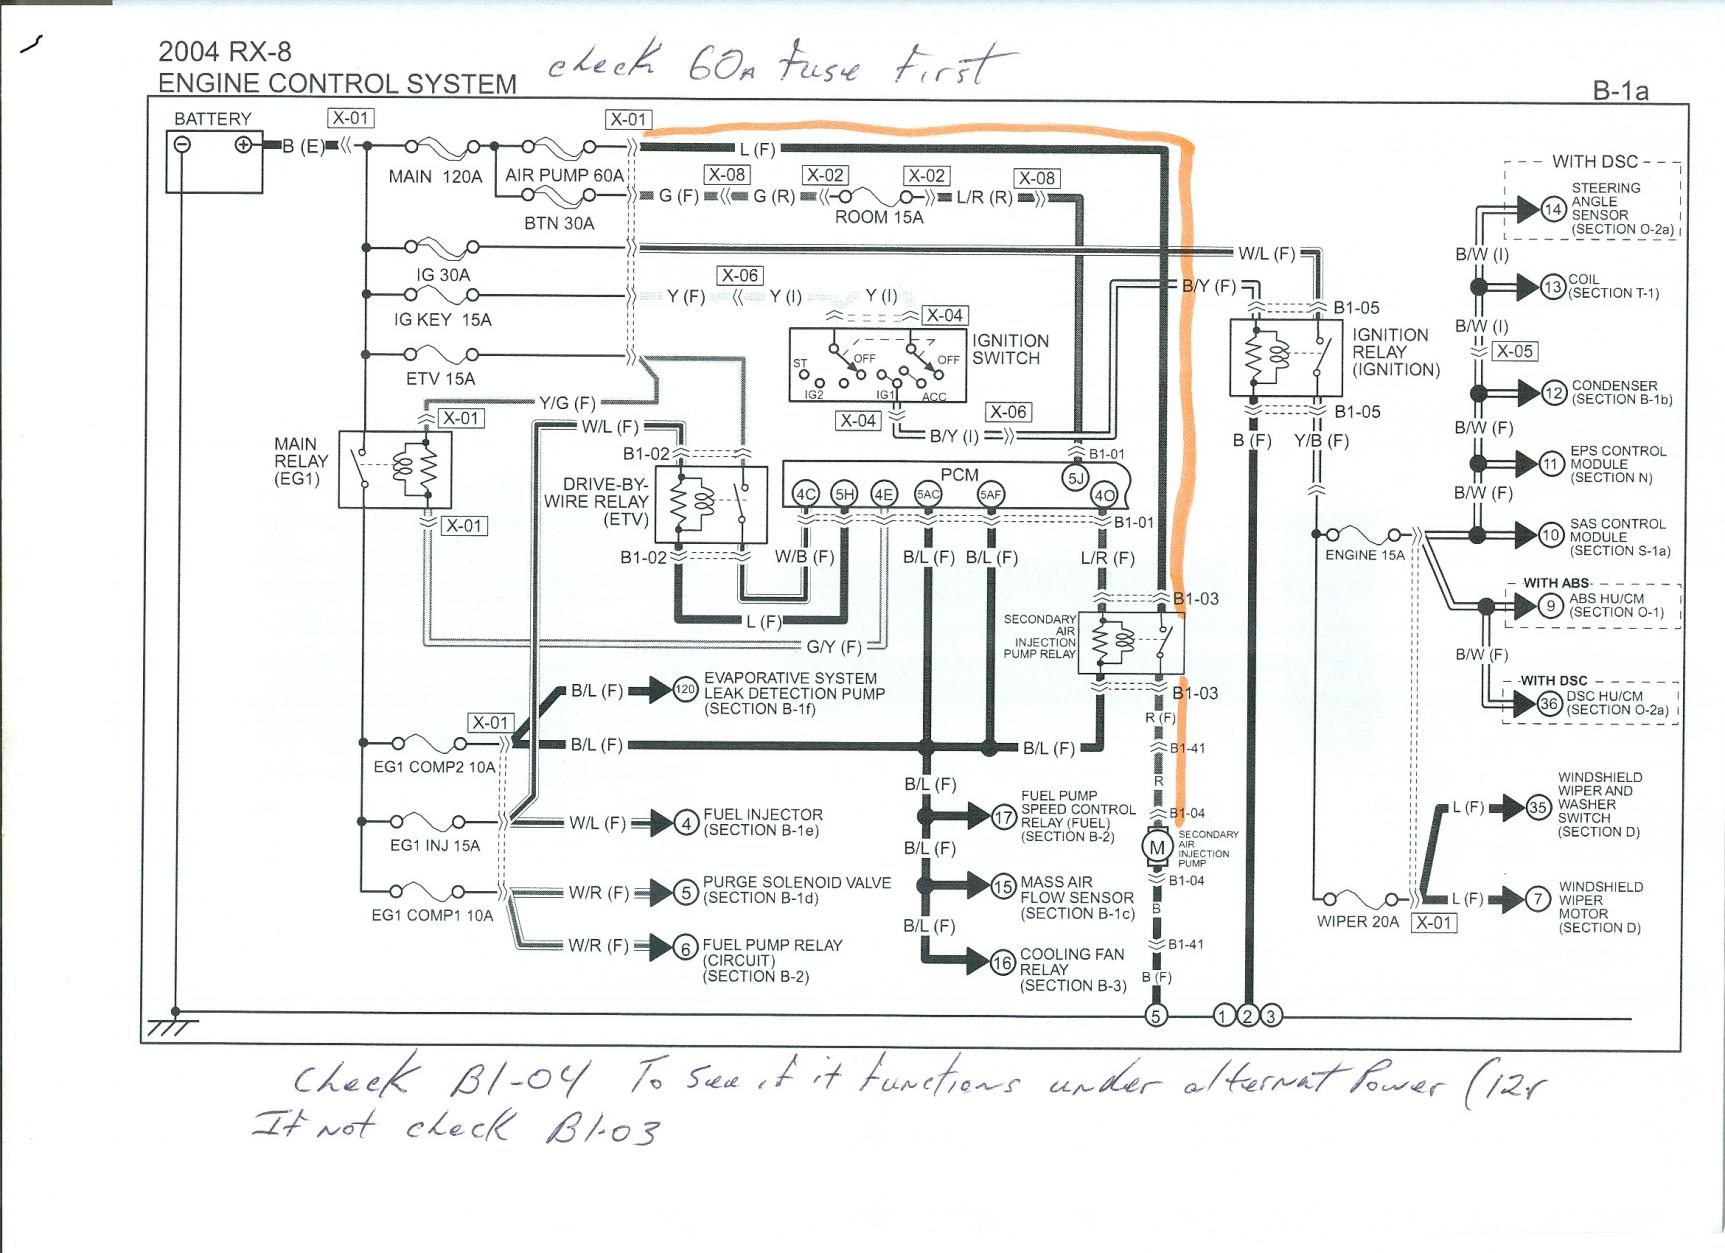 Code P Intake Manifold Tuning Valve Control Low Bank 1a